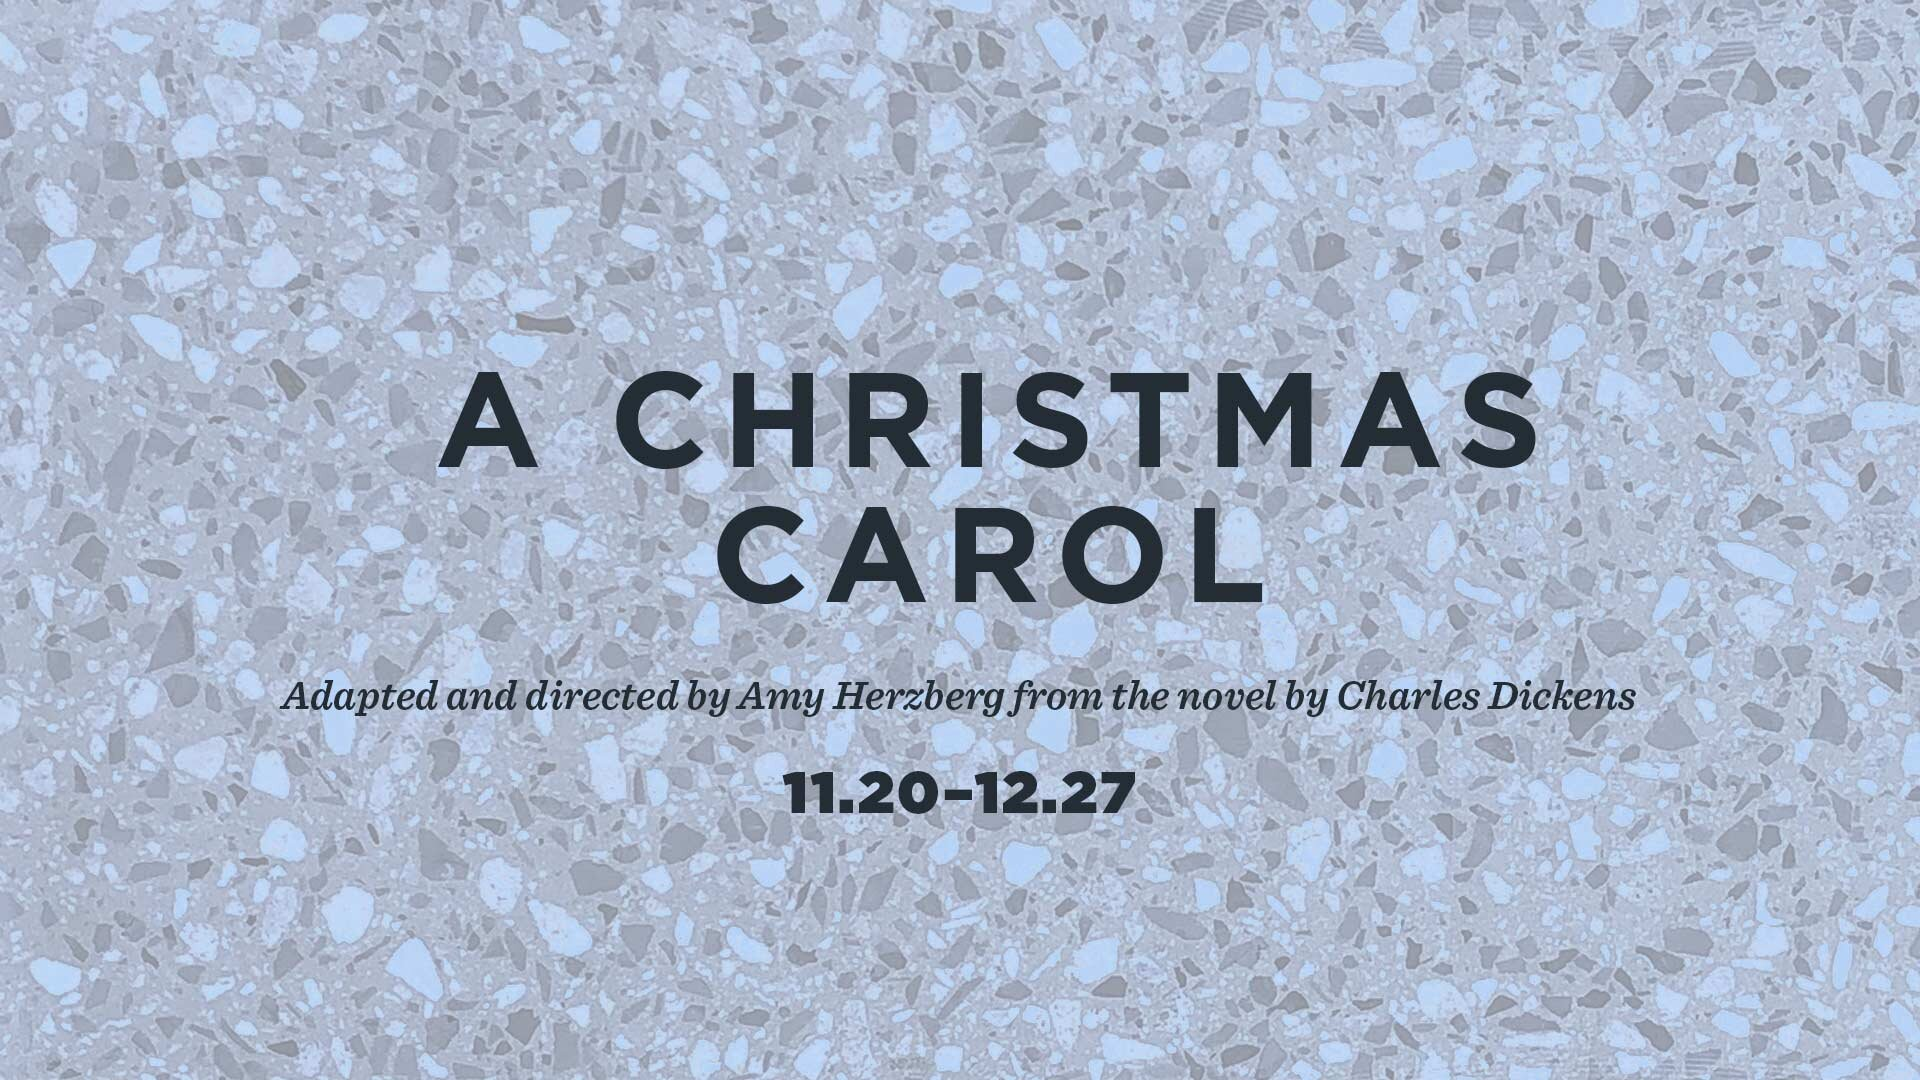 Show-Website-Page-Header-Christmas-Carol-1-1920x1080.jpg